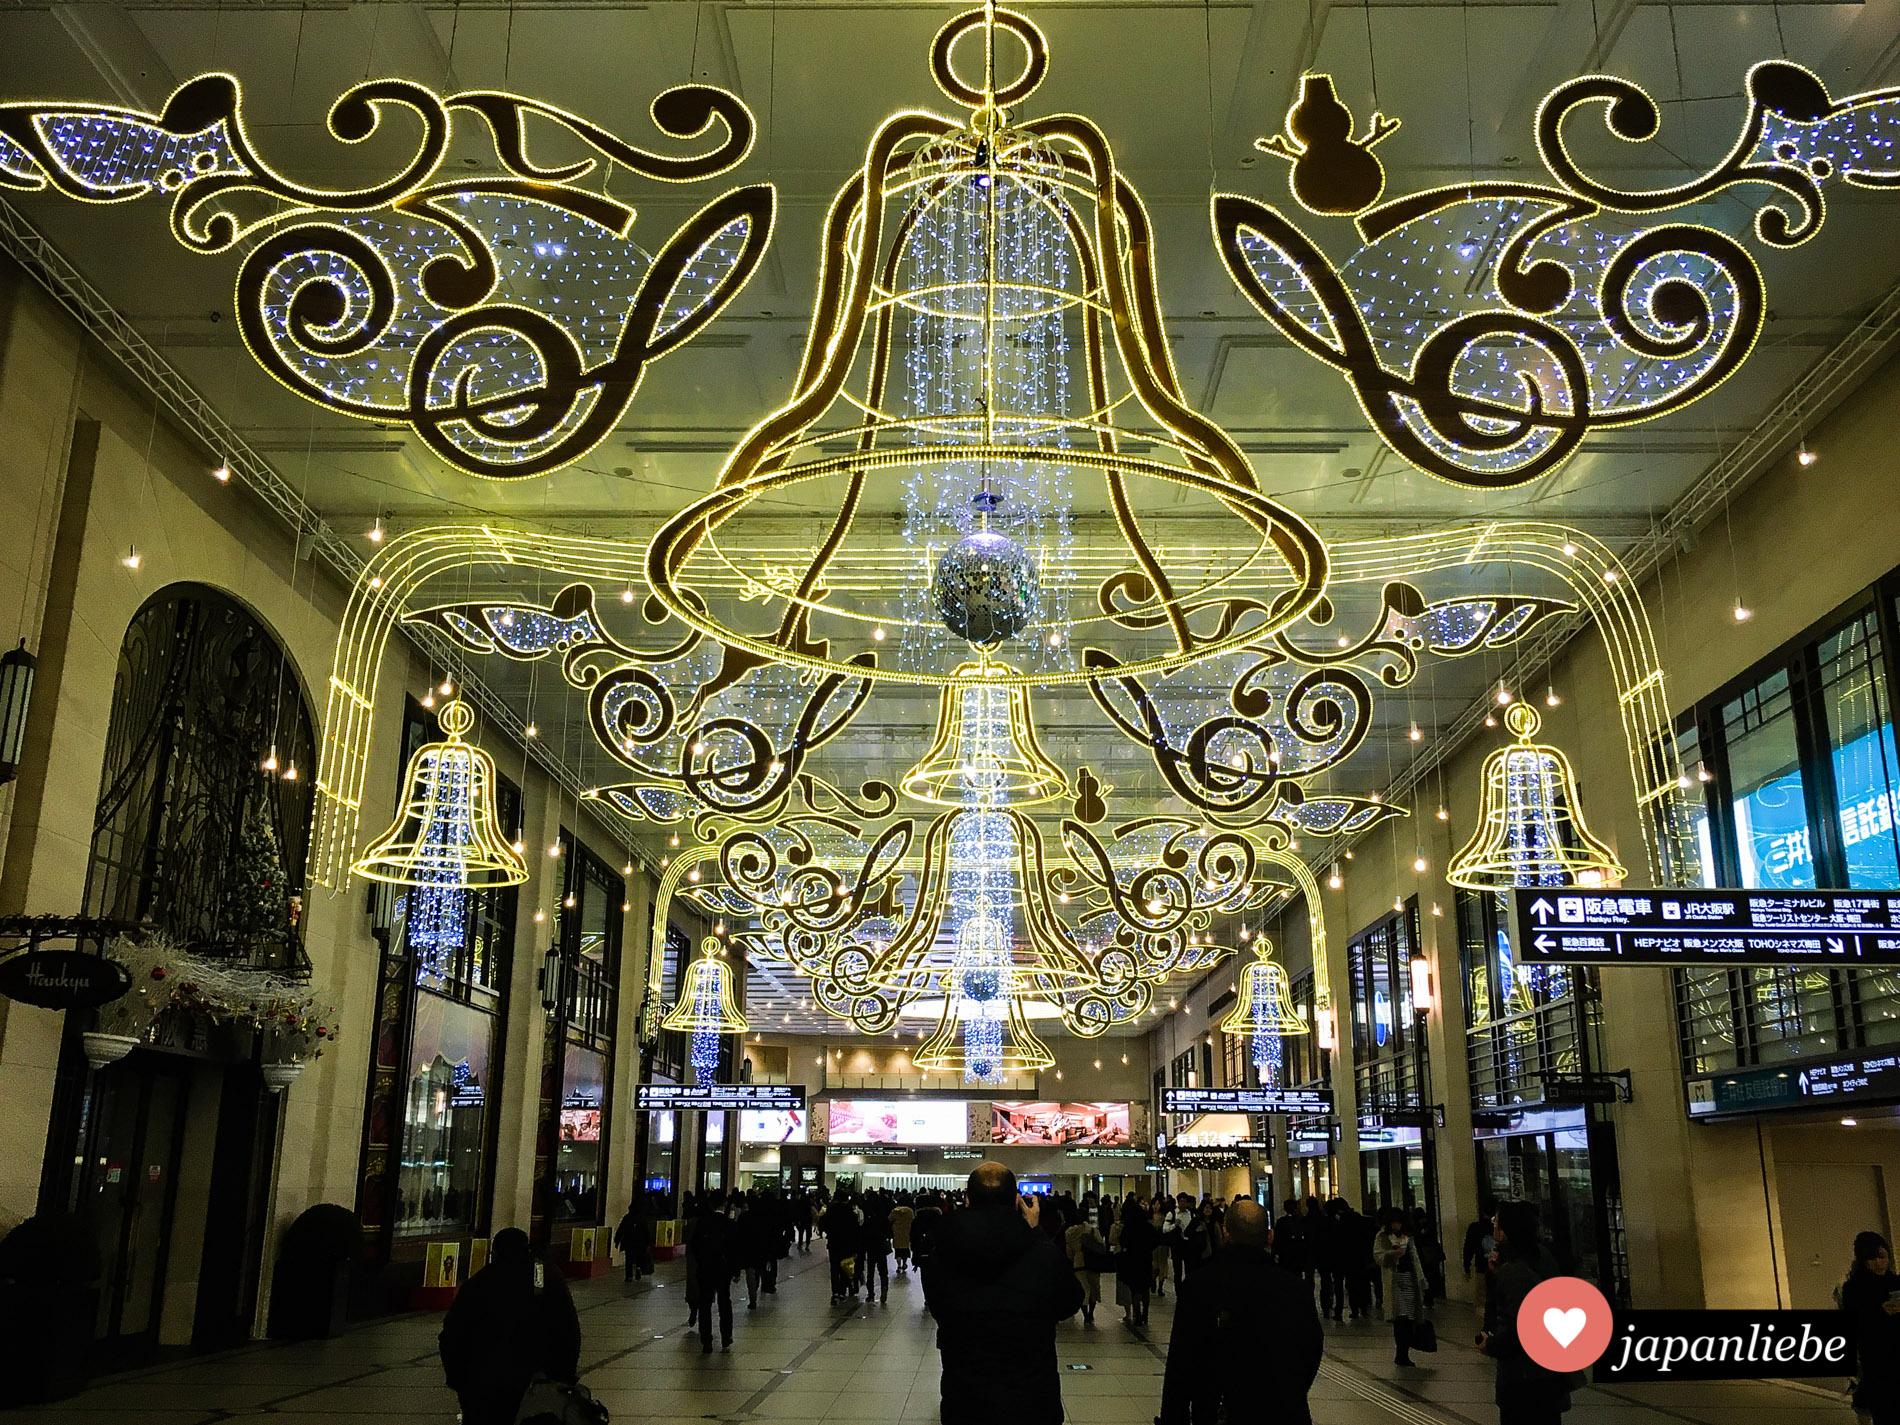 Weihnachts-Illumination am Bahnhof Umeda in Ōsaka.